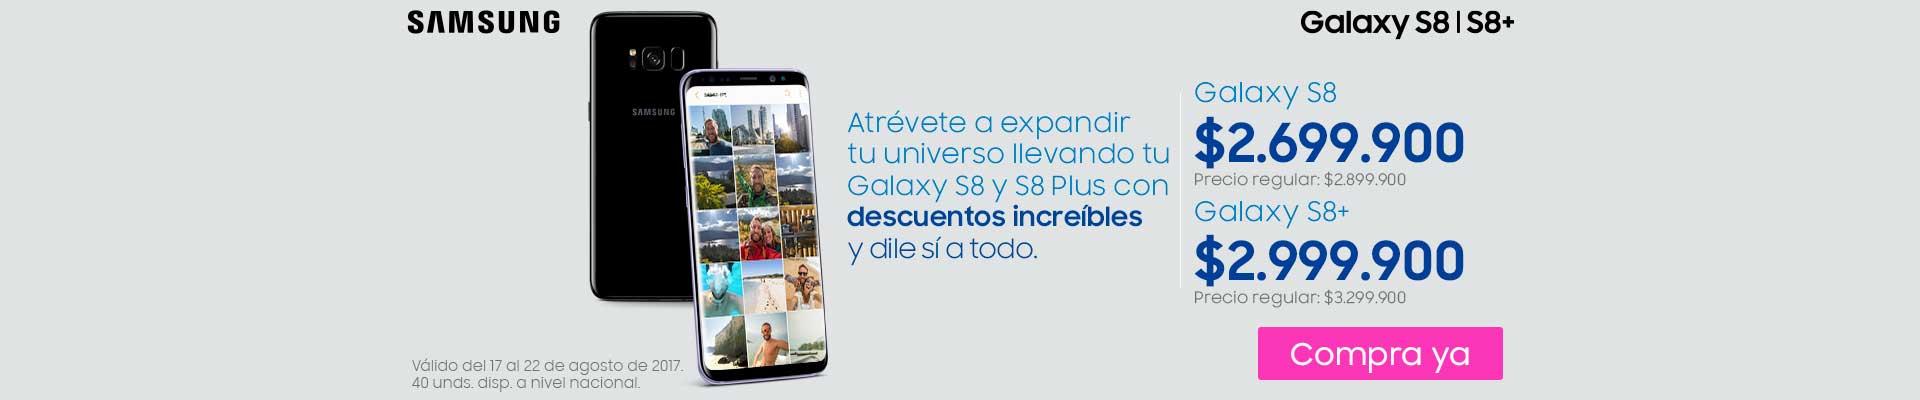 PAUTA Ppal KT-8-celulares-SamsungS8-cat-agosto-17-22